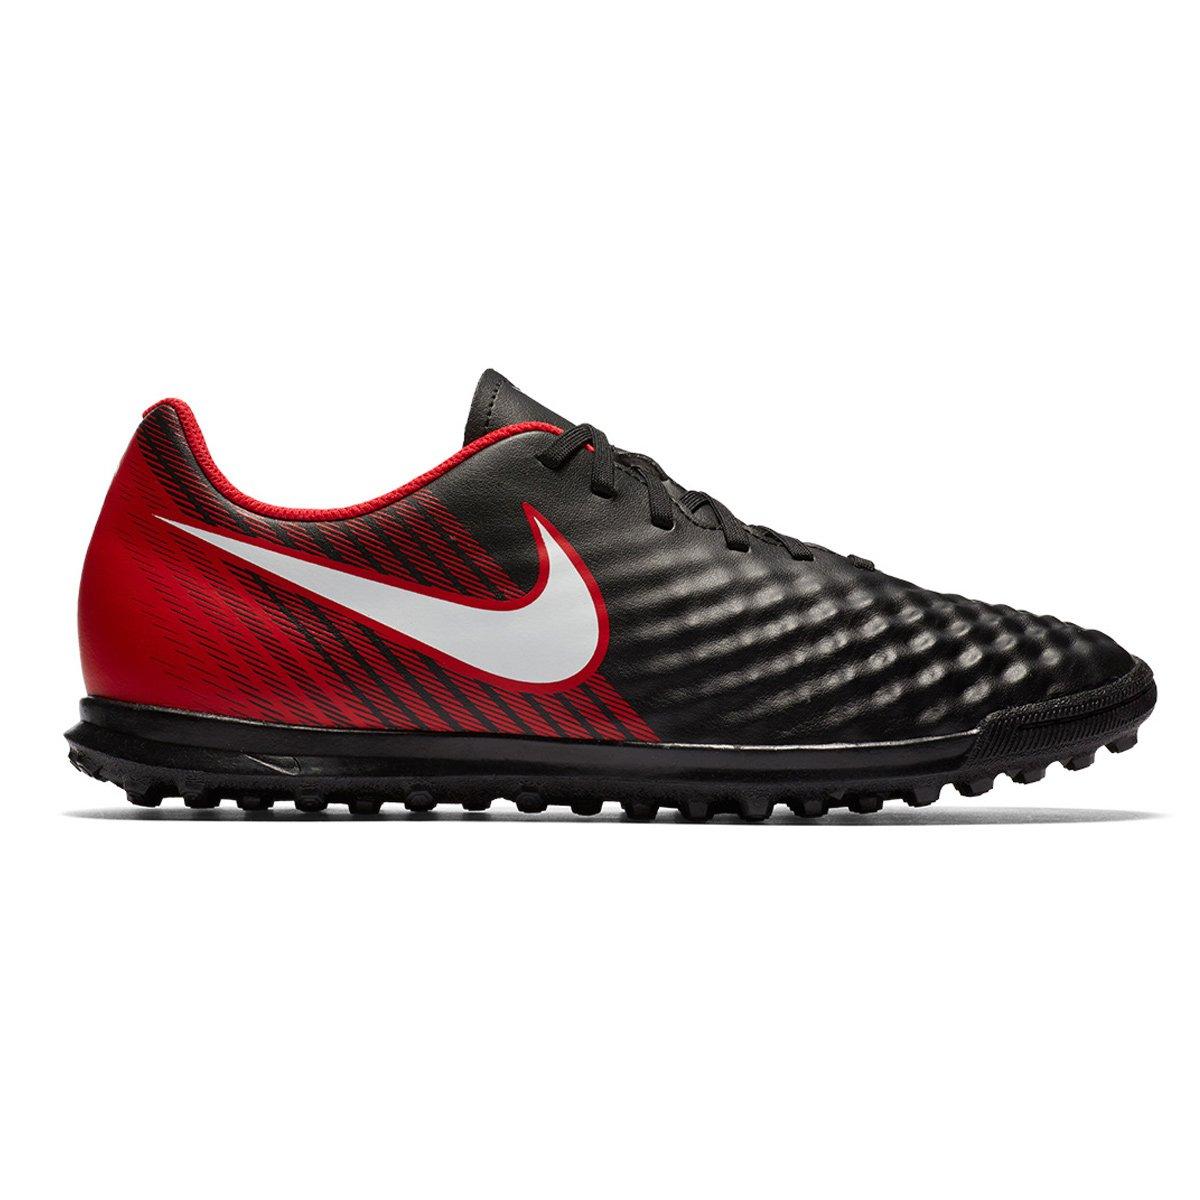 Amplie a imagem. Chuteira Society Nike Magistax Ola II TF  Chuteira Society  Nike Magistax Ola II TF  Chuteira ... 9421e28664cb2